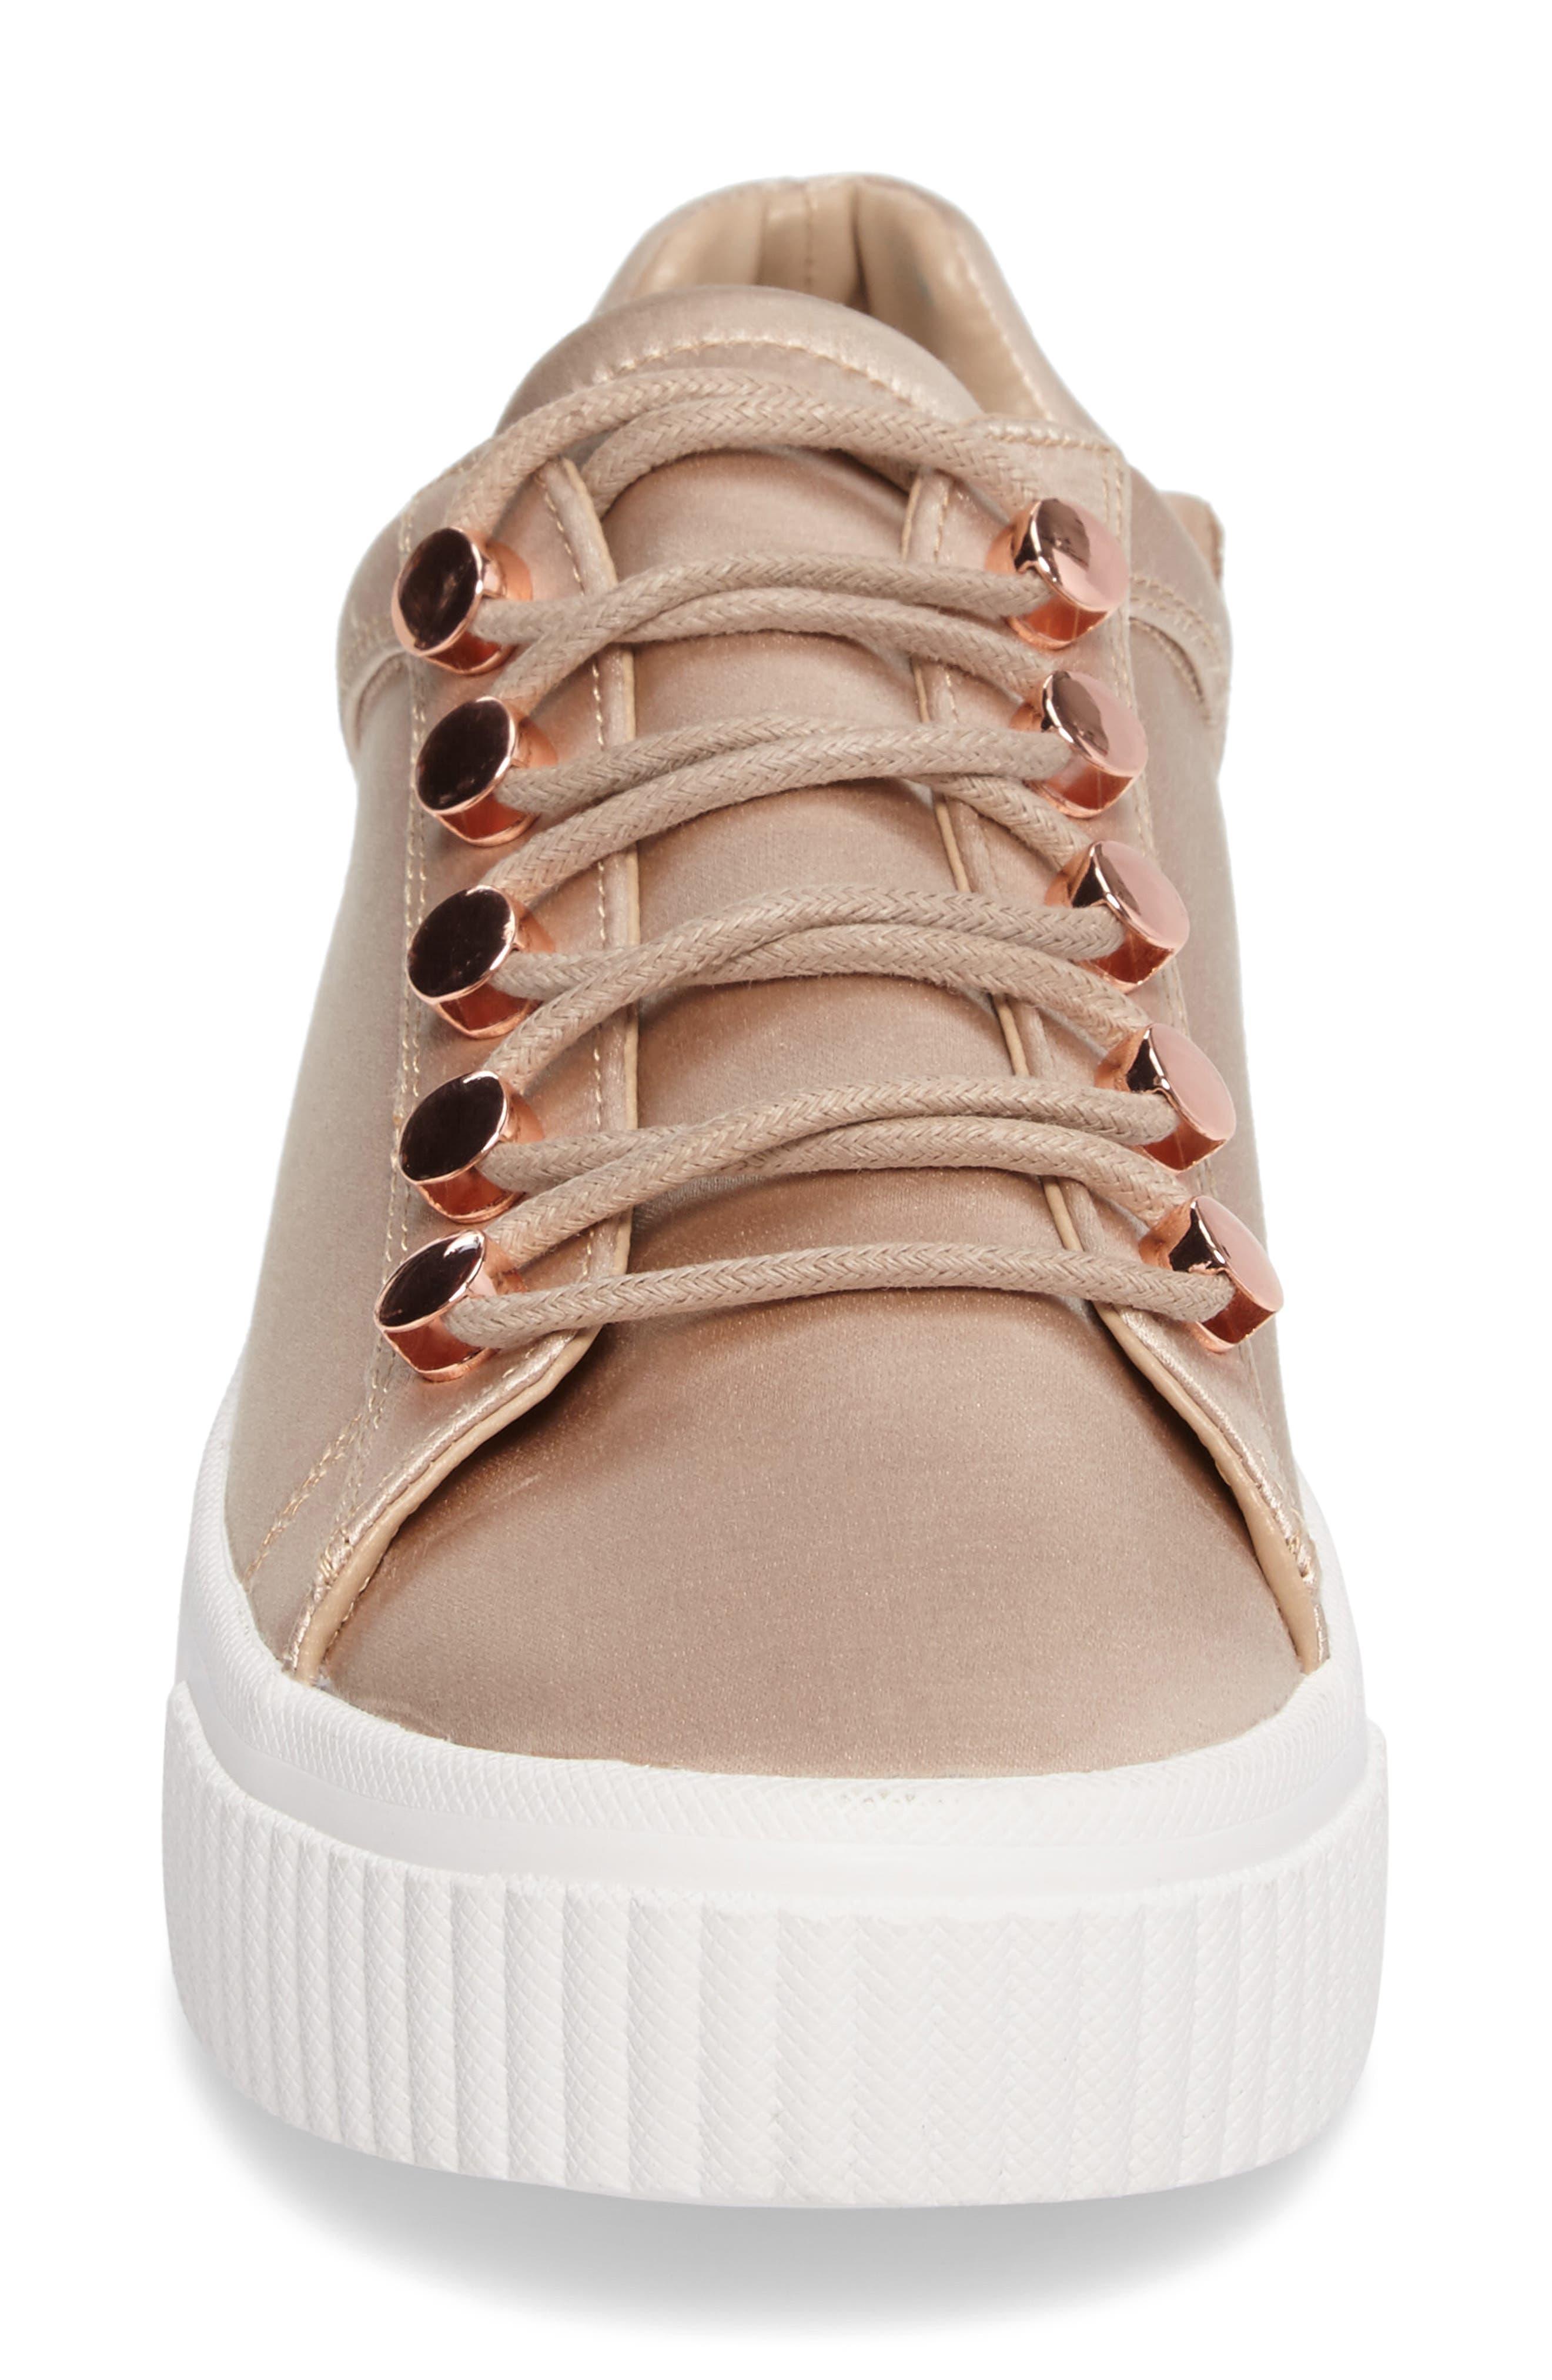 Rae 3 Platform Sneaker,                             Alternate thumbnail 4, color,                             683